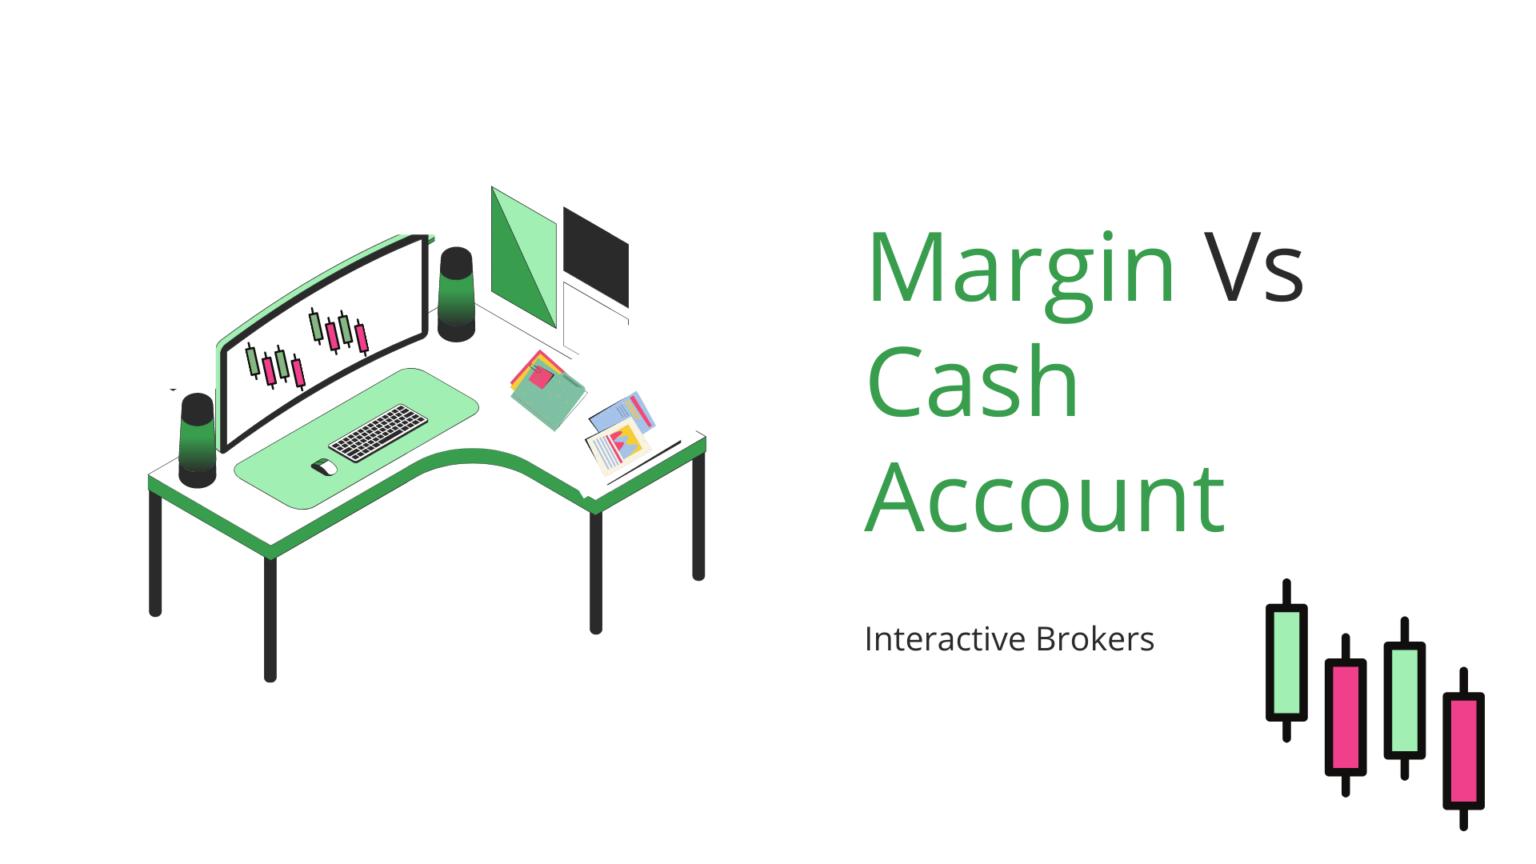 Margin Vs Cash Account Interactive Brokers